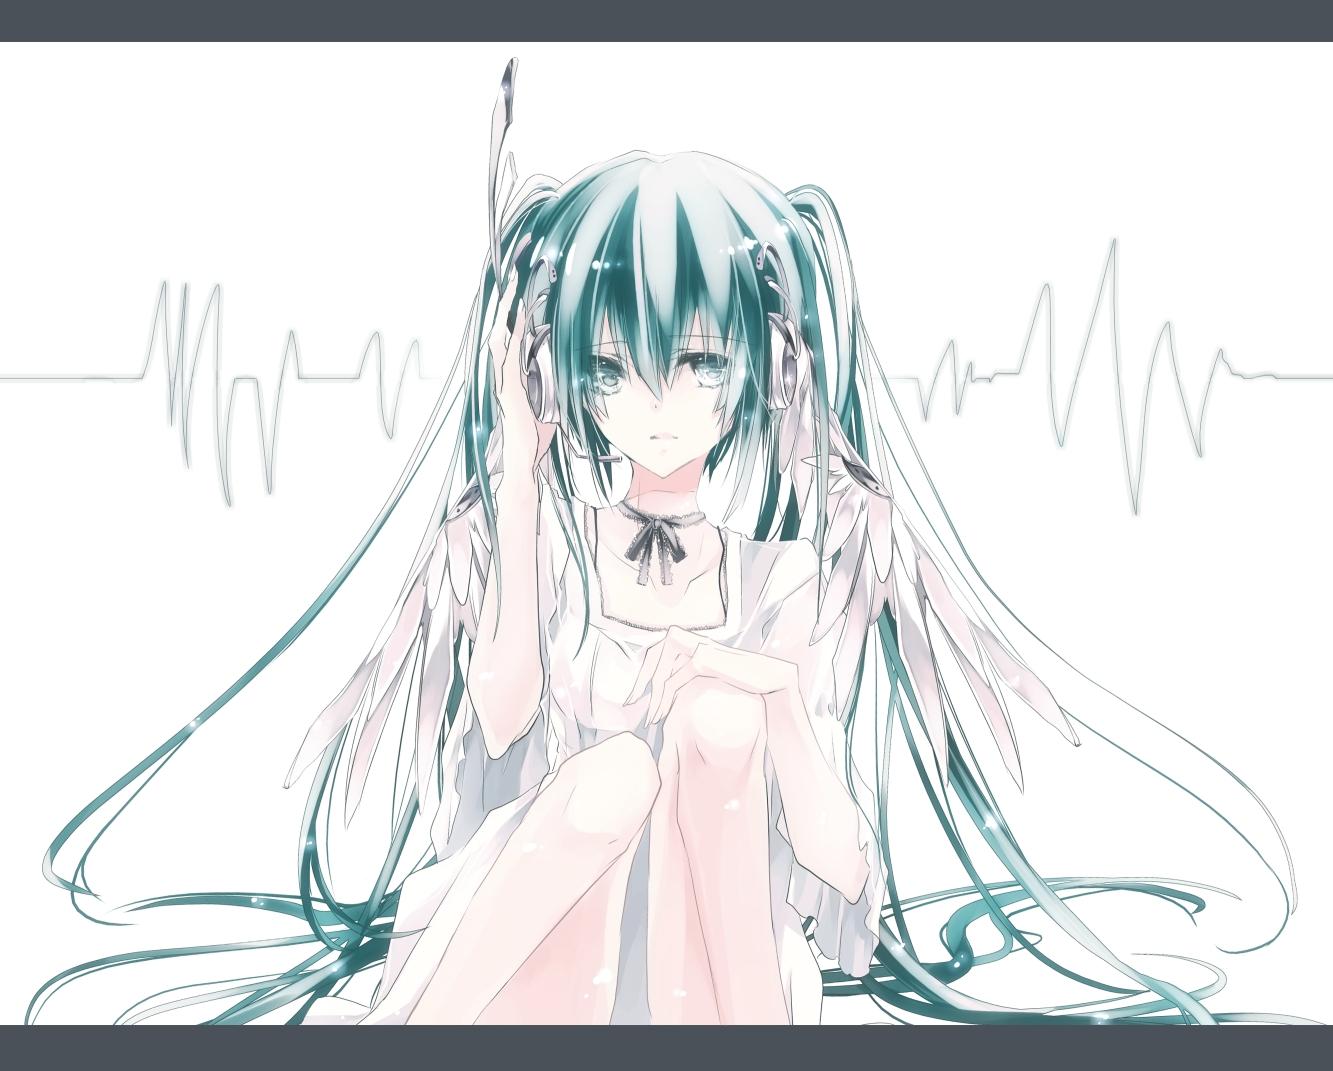 hatsune_miku headphones twintails vocaloid white